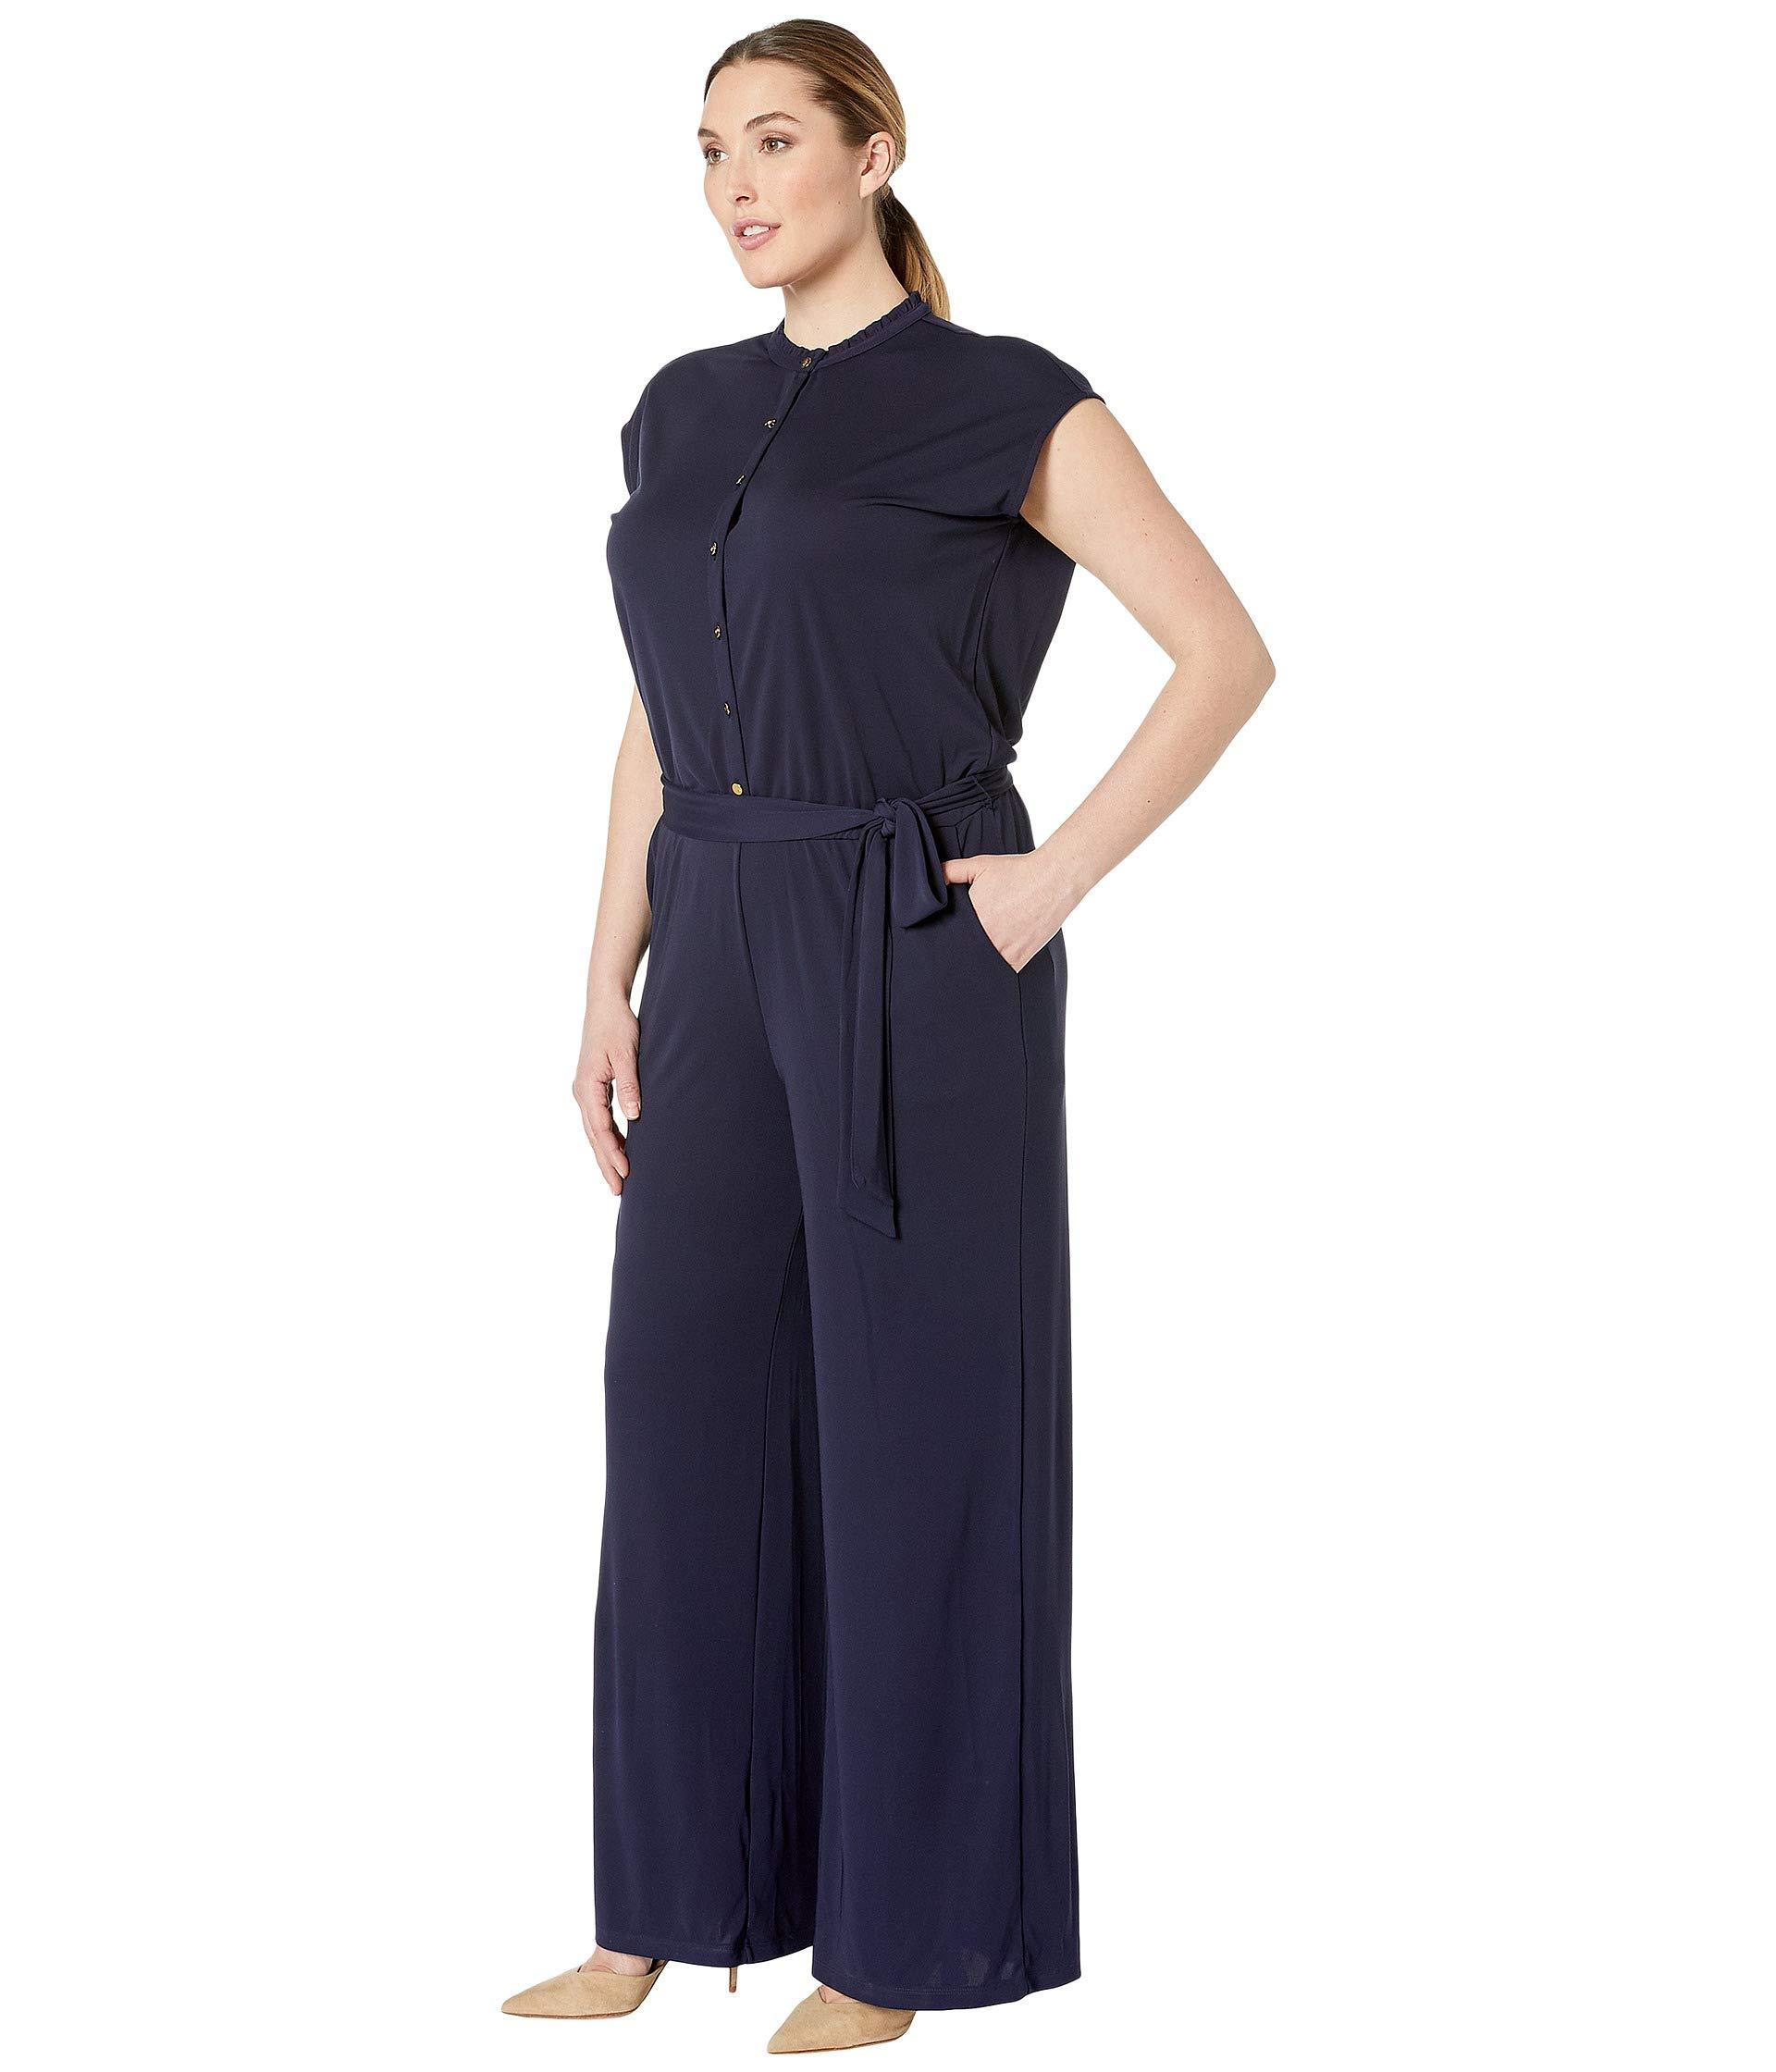 68091bb030a Lyst - Lauren by Ralph Lauren Plus Size Buttoned Jersey Jumpsuit (navy)  Women s Jumpsuit   Rompers One Piece in Blue